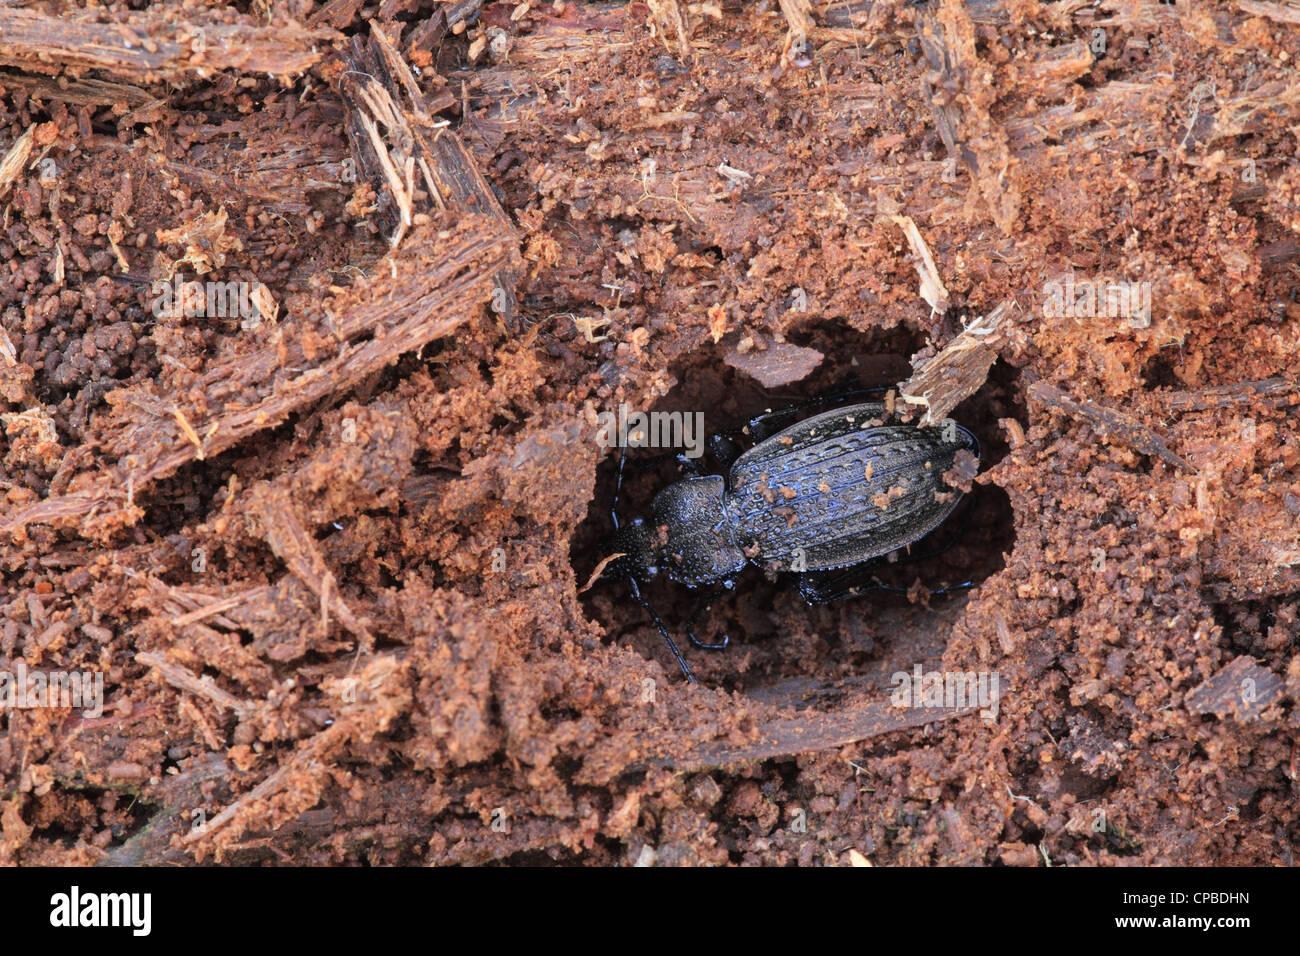 Carabus granulatus - a ground beetle species hibernating. - Stock Image